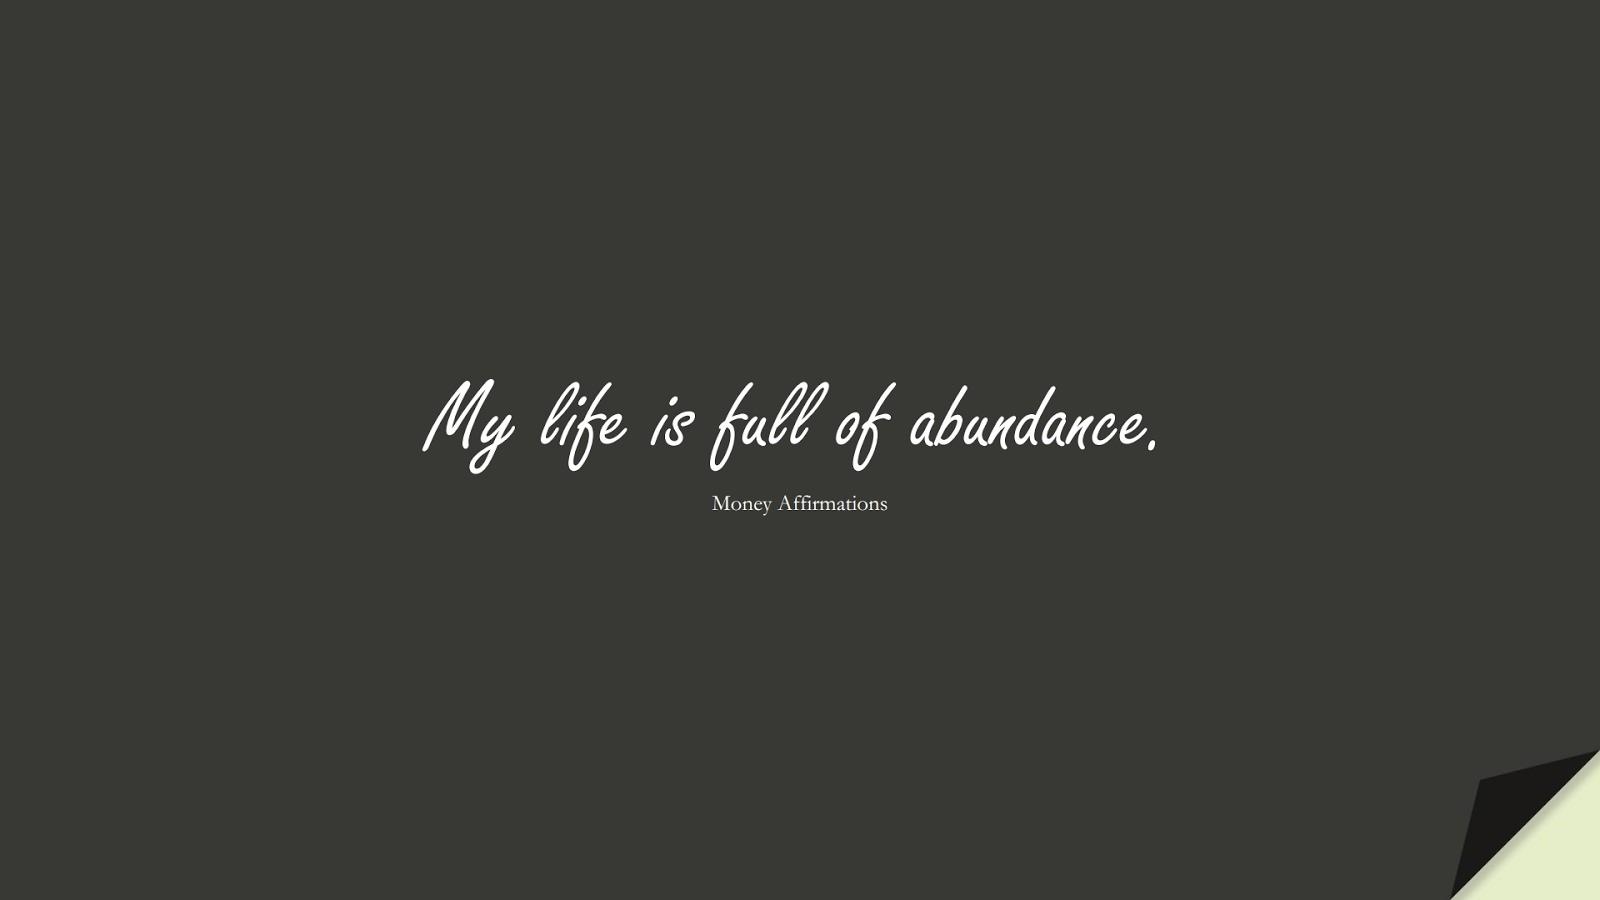 My life is full of abundance. (Money Affirmations);  #MoneyQuotes